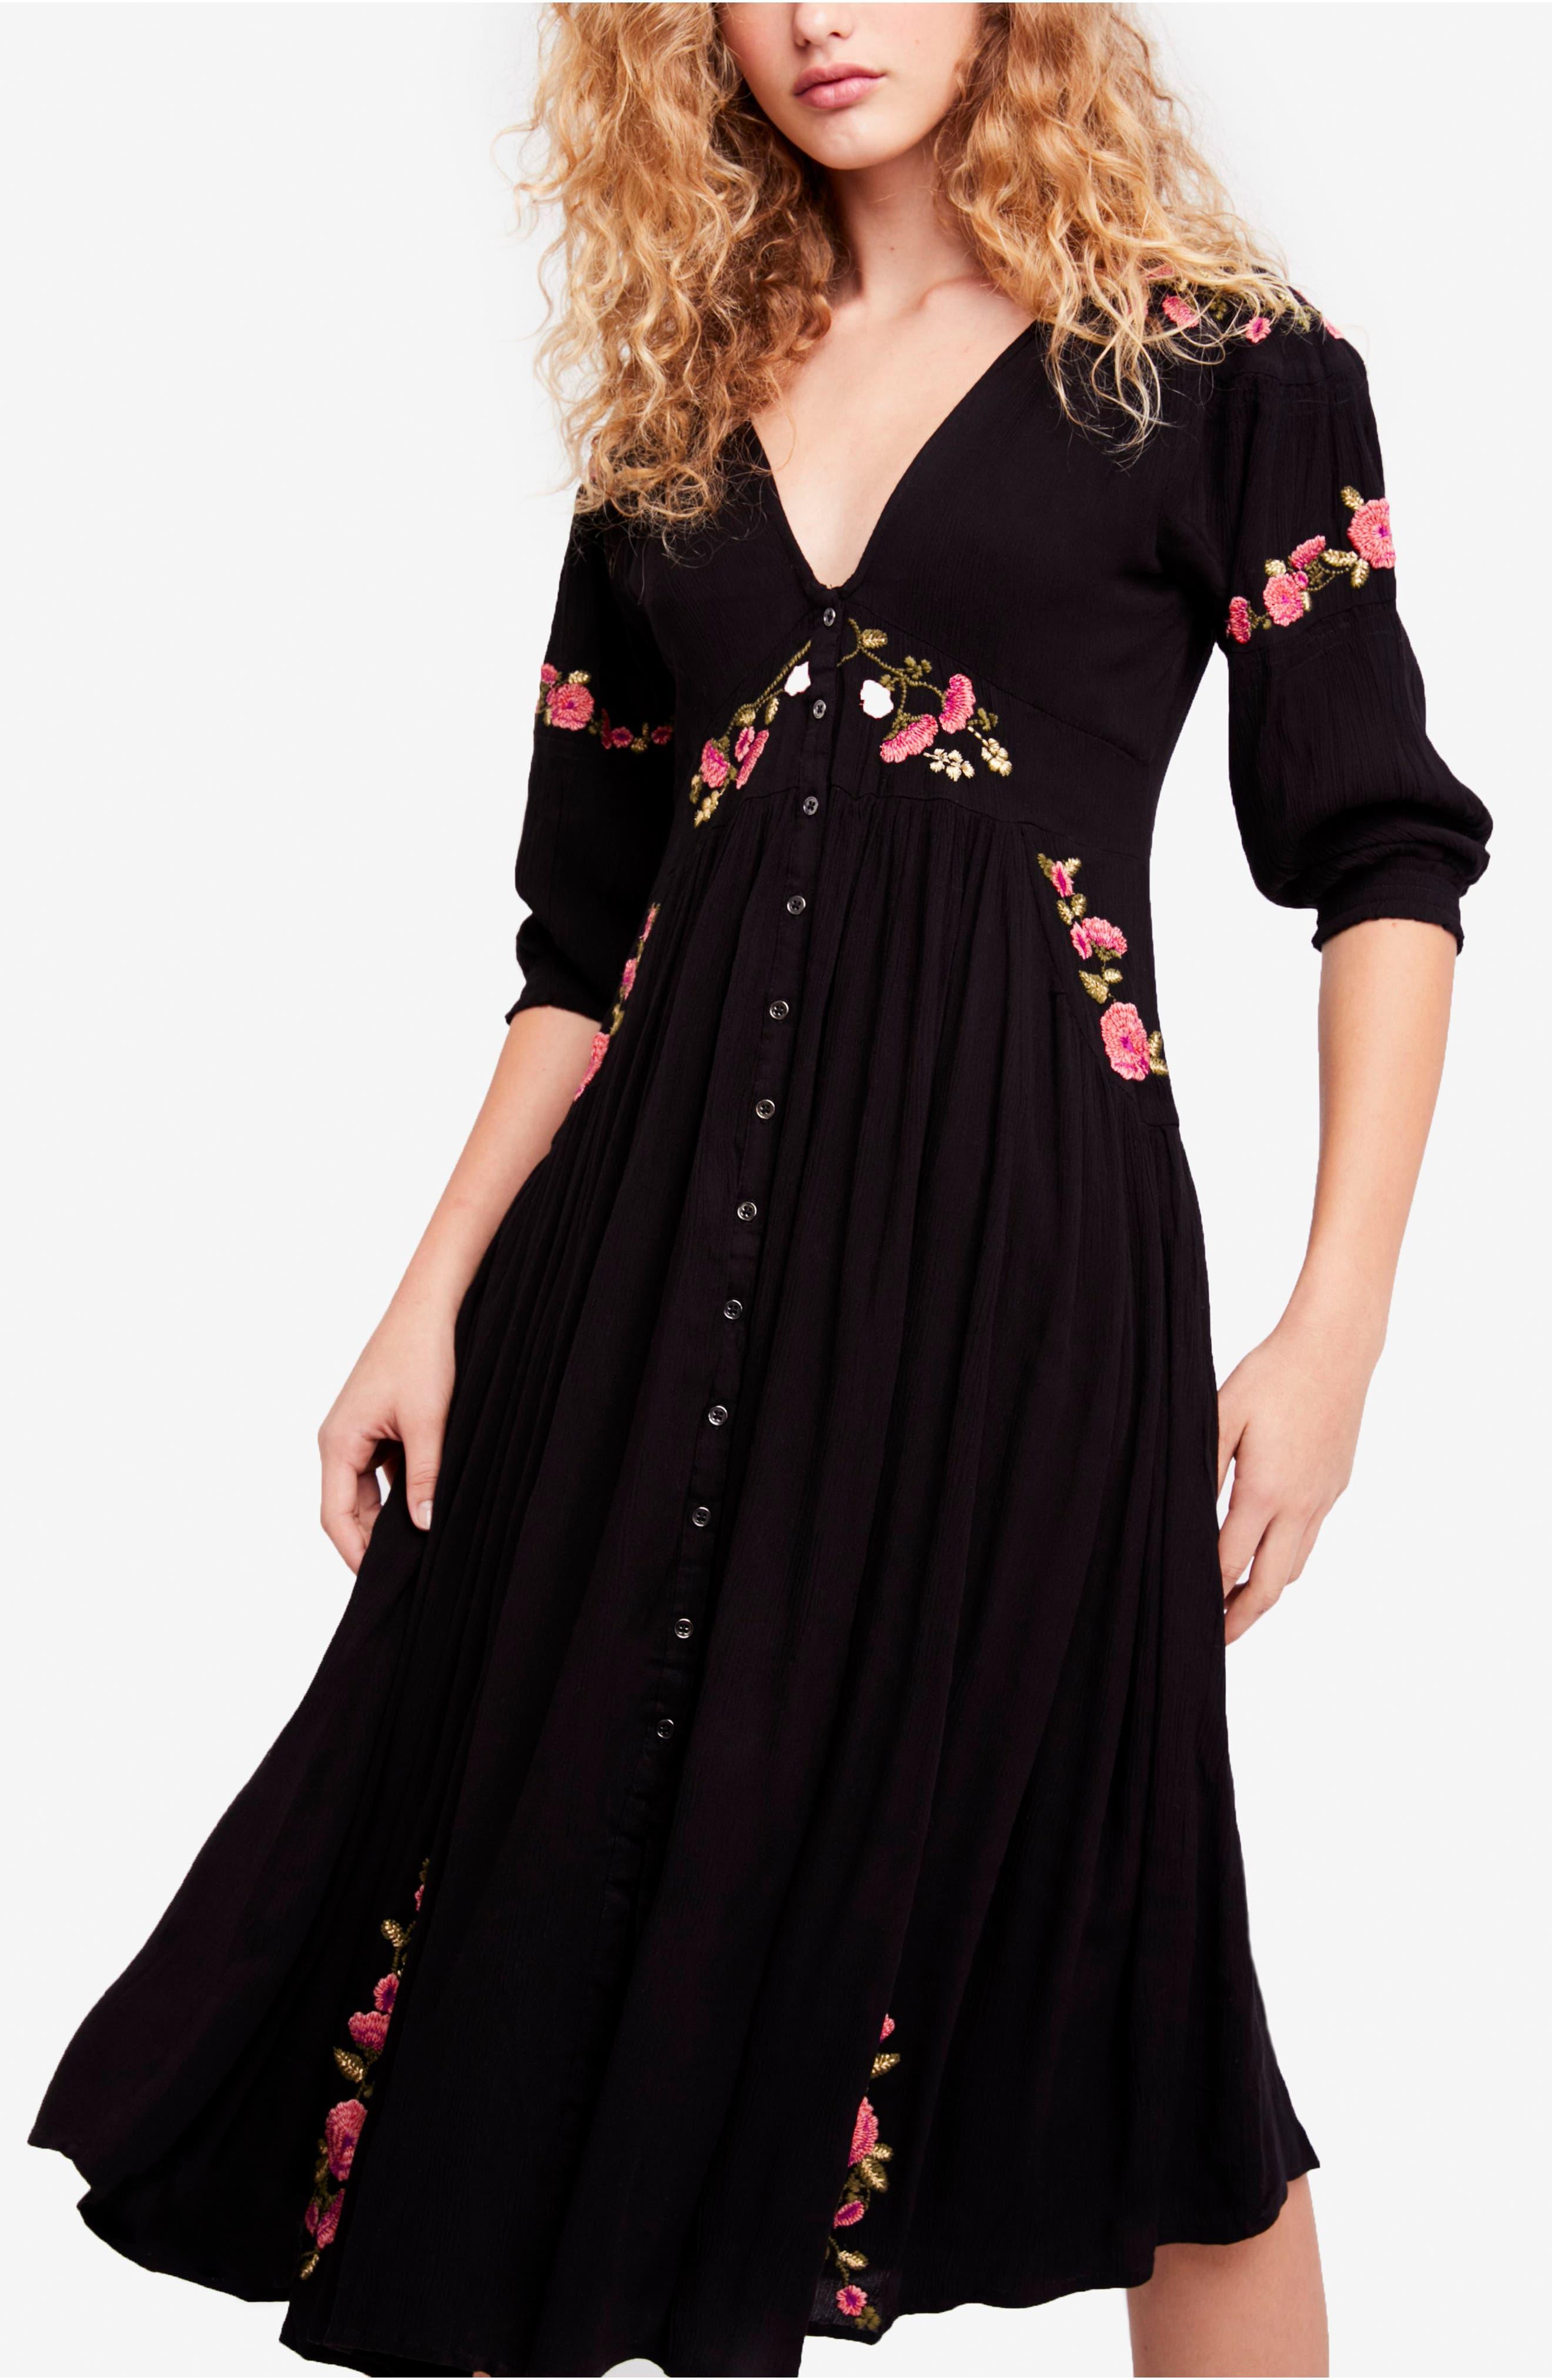 Day Glow Midi Dress,                         Main,                         color, Black Combo